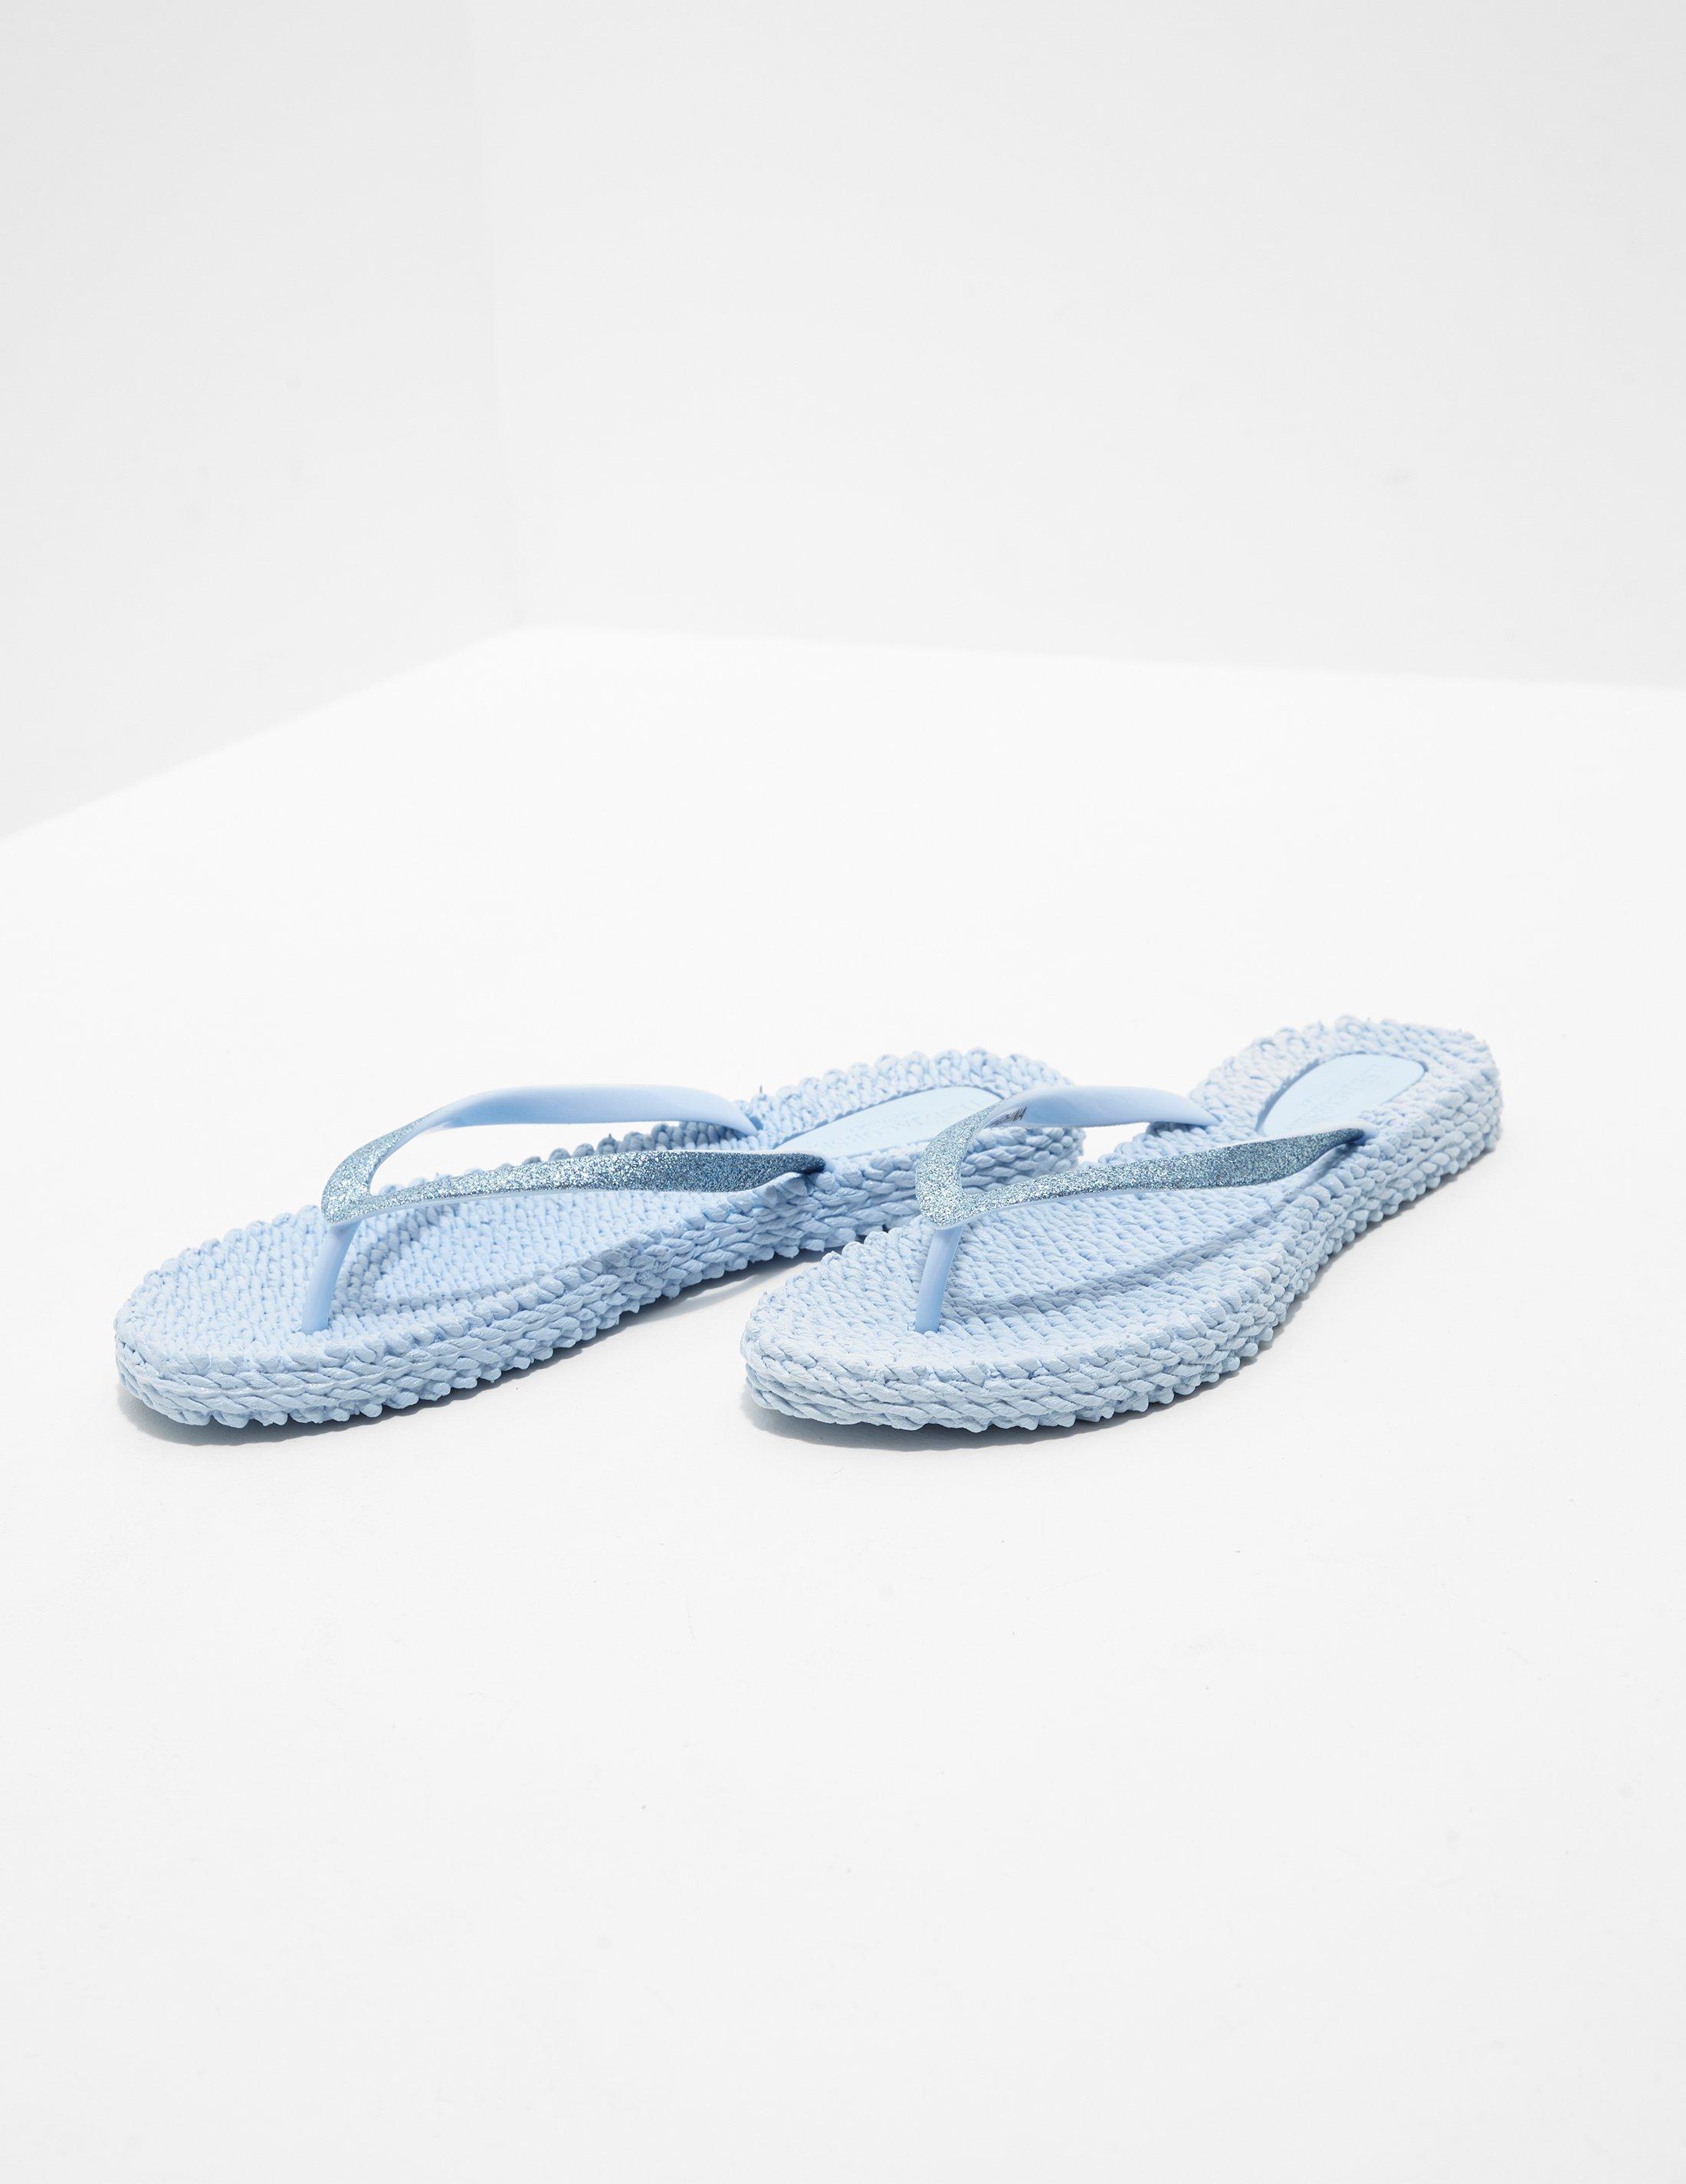 e1549d531f3c Lyst - Ilse Jacobsen Woven Flip Flops Blue in Blue